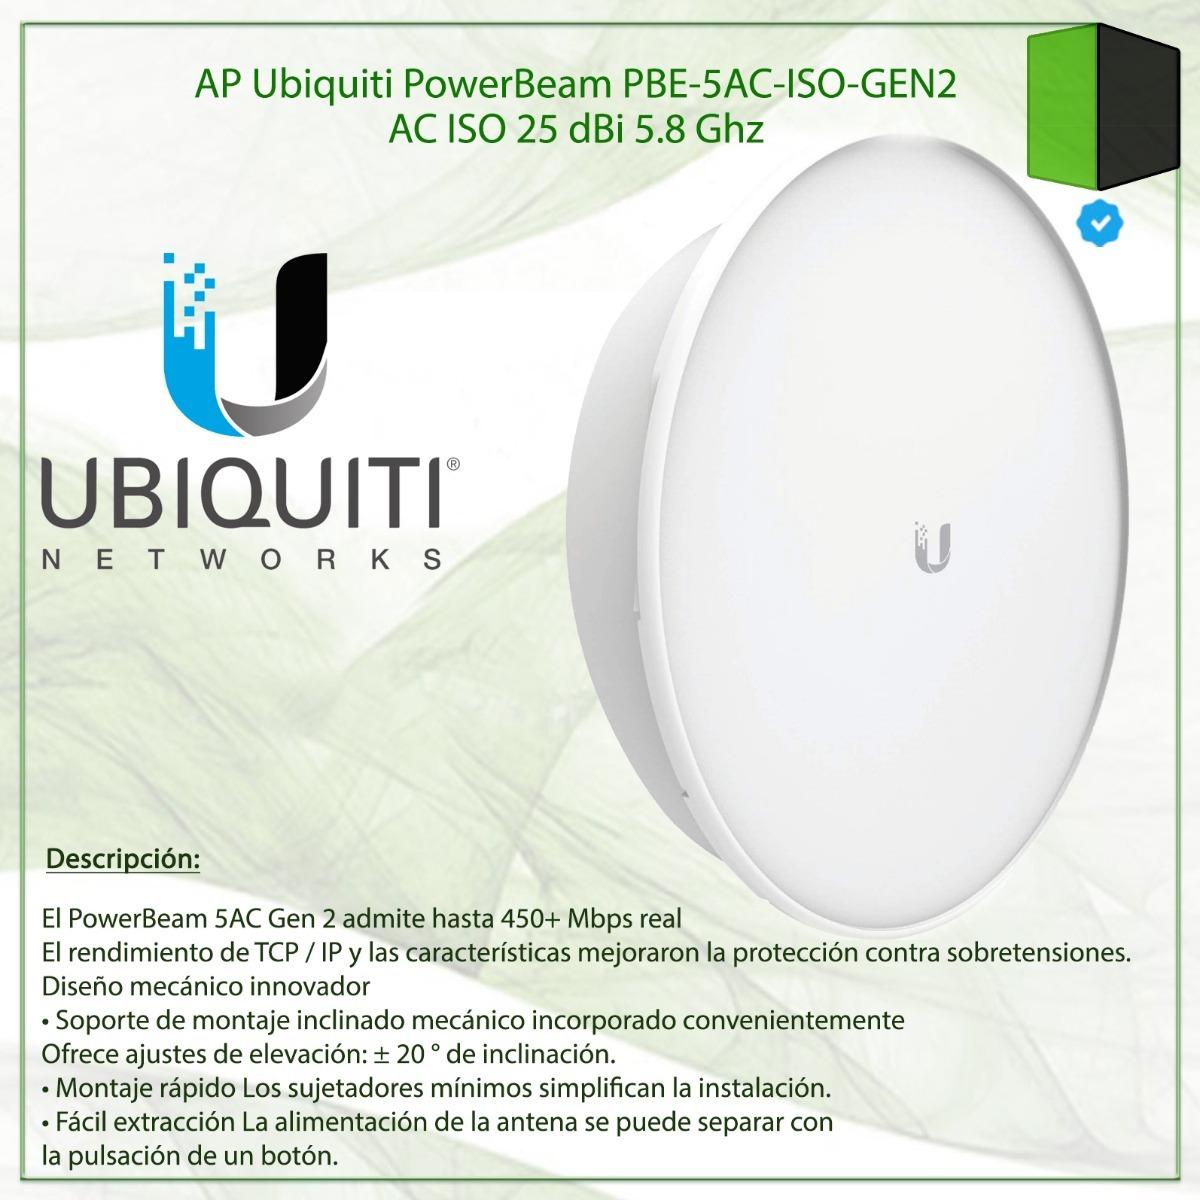 Ap Ubiquiti Powerbeam Pbe-5ac-iso-gen2 Ac Iso 25 Dbi 5 8 Ghz